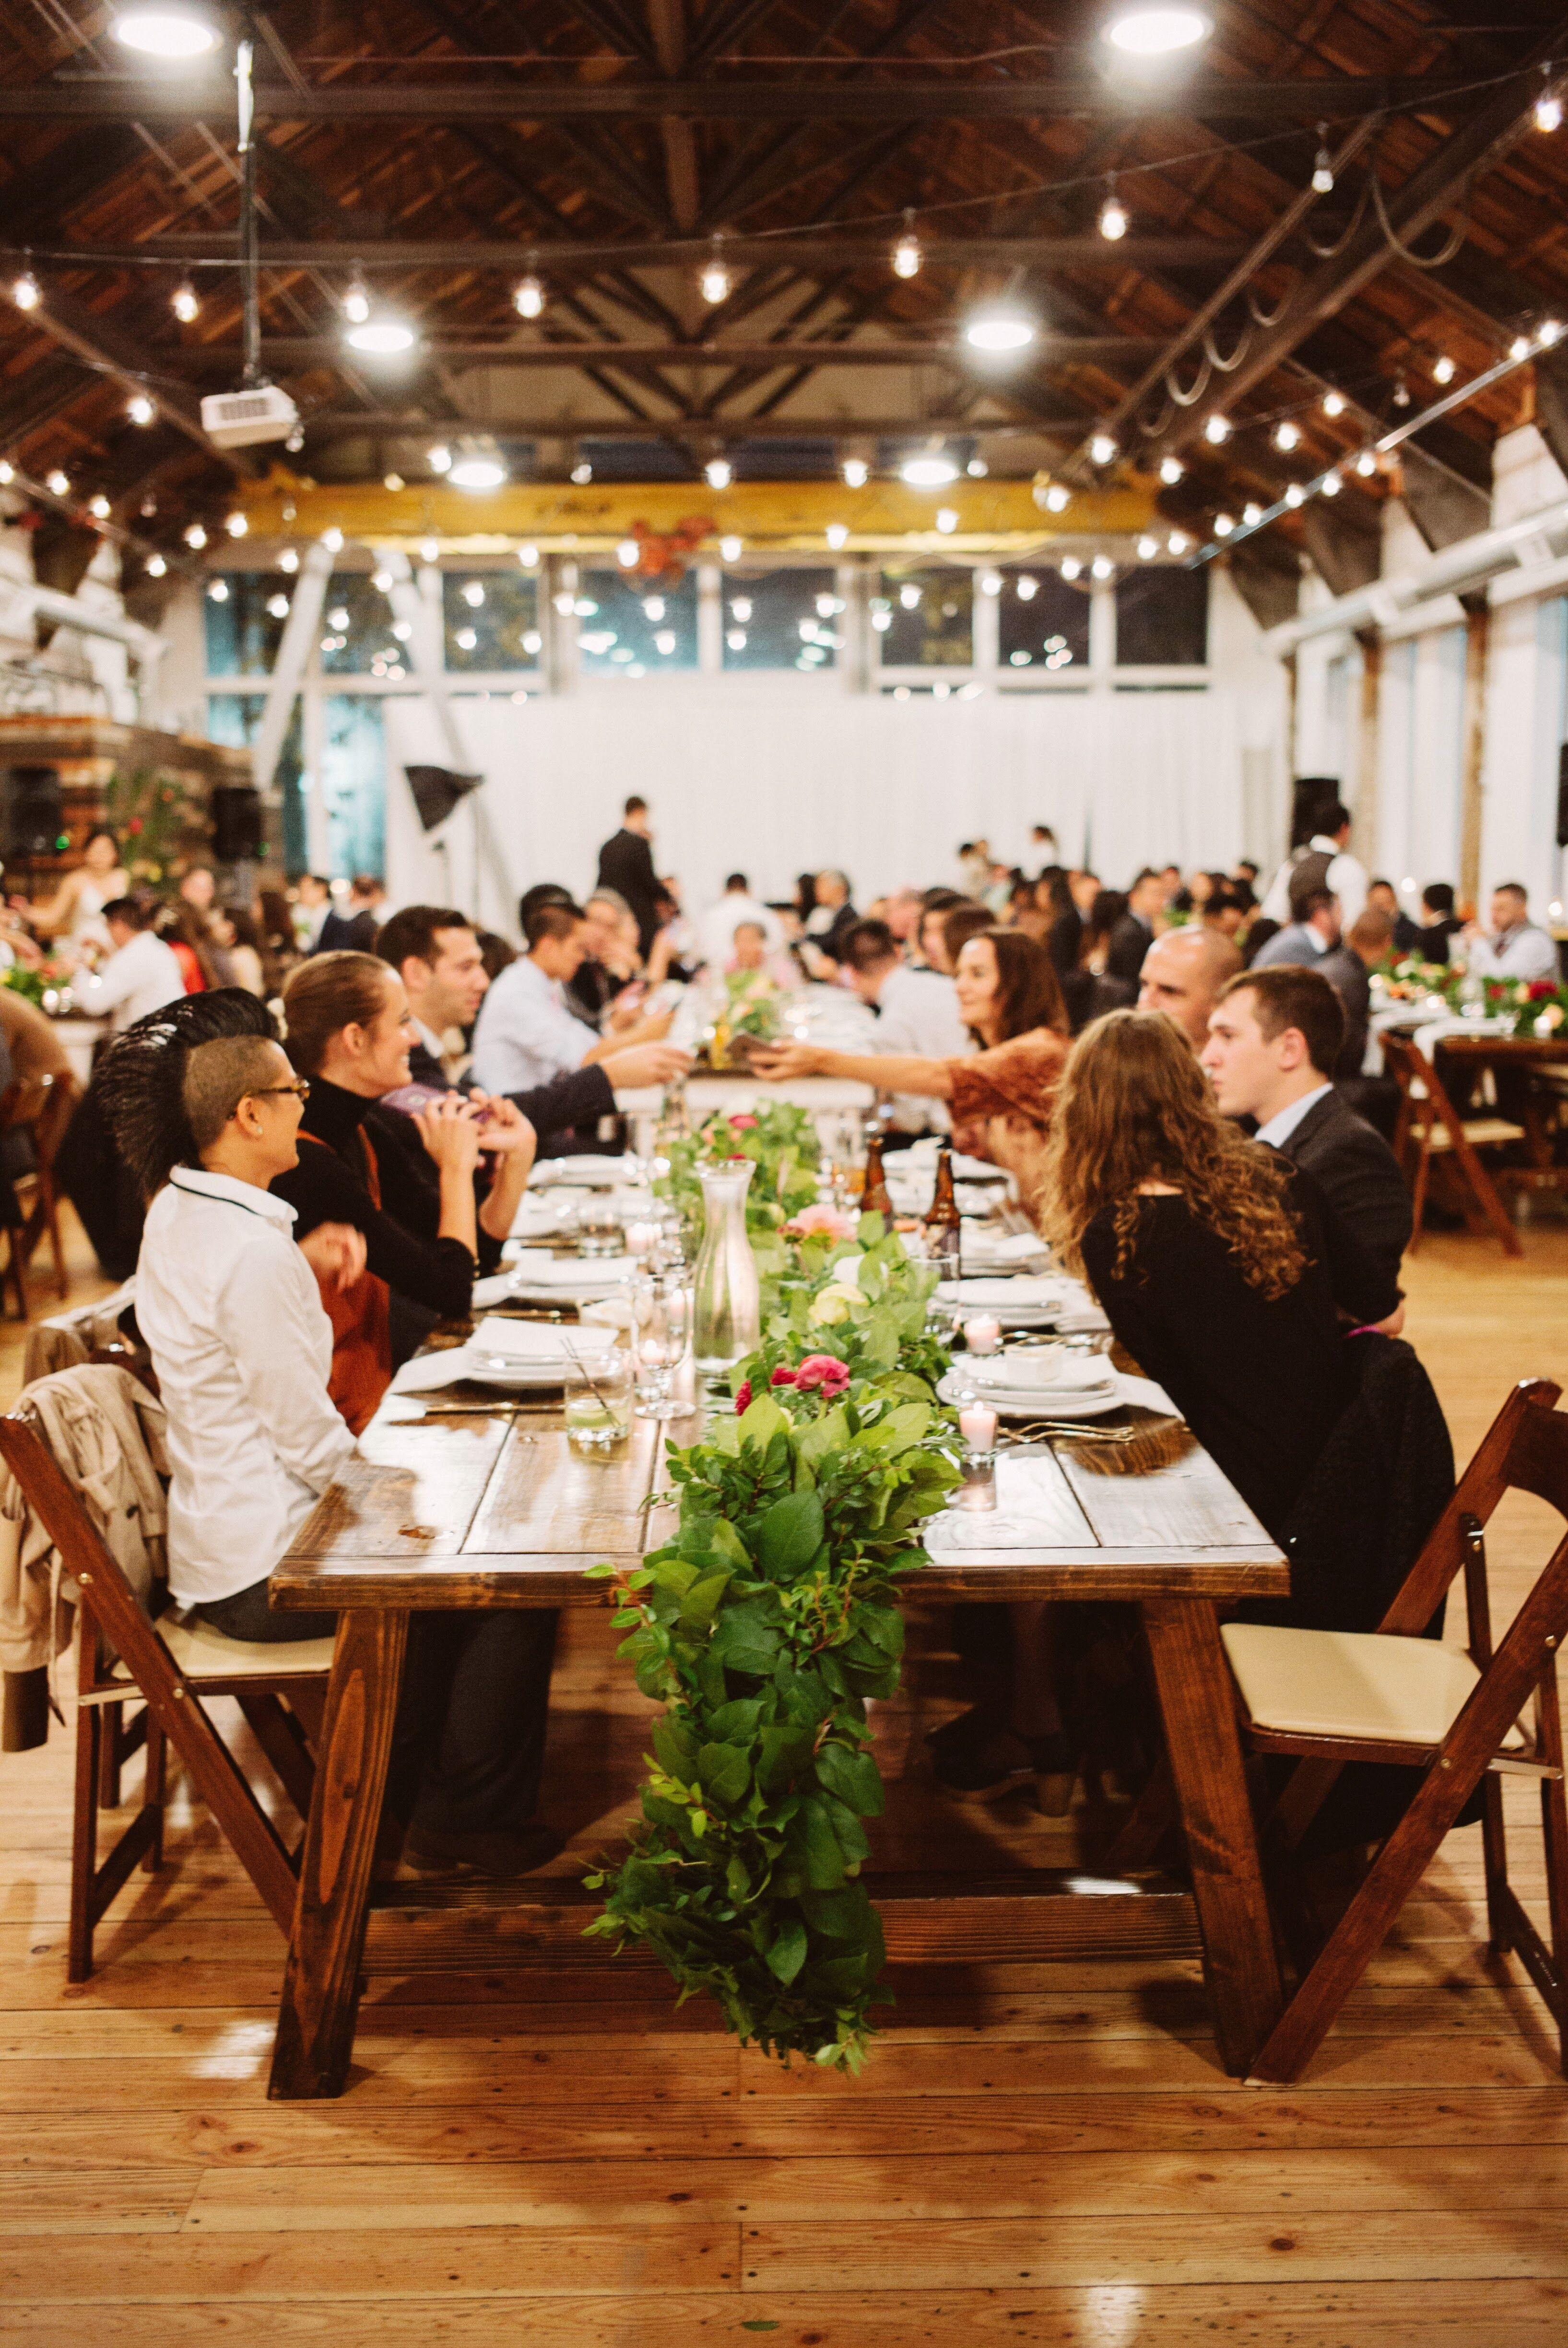 Wedding reception venues in seattle wa the knot metropolist seattle junglespirit Images